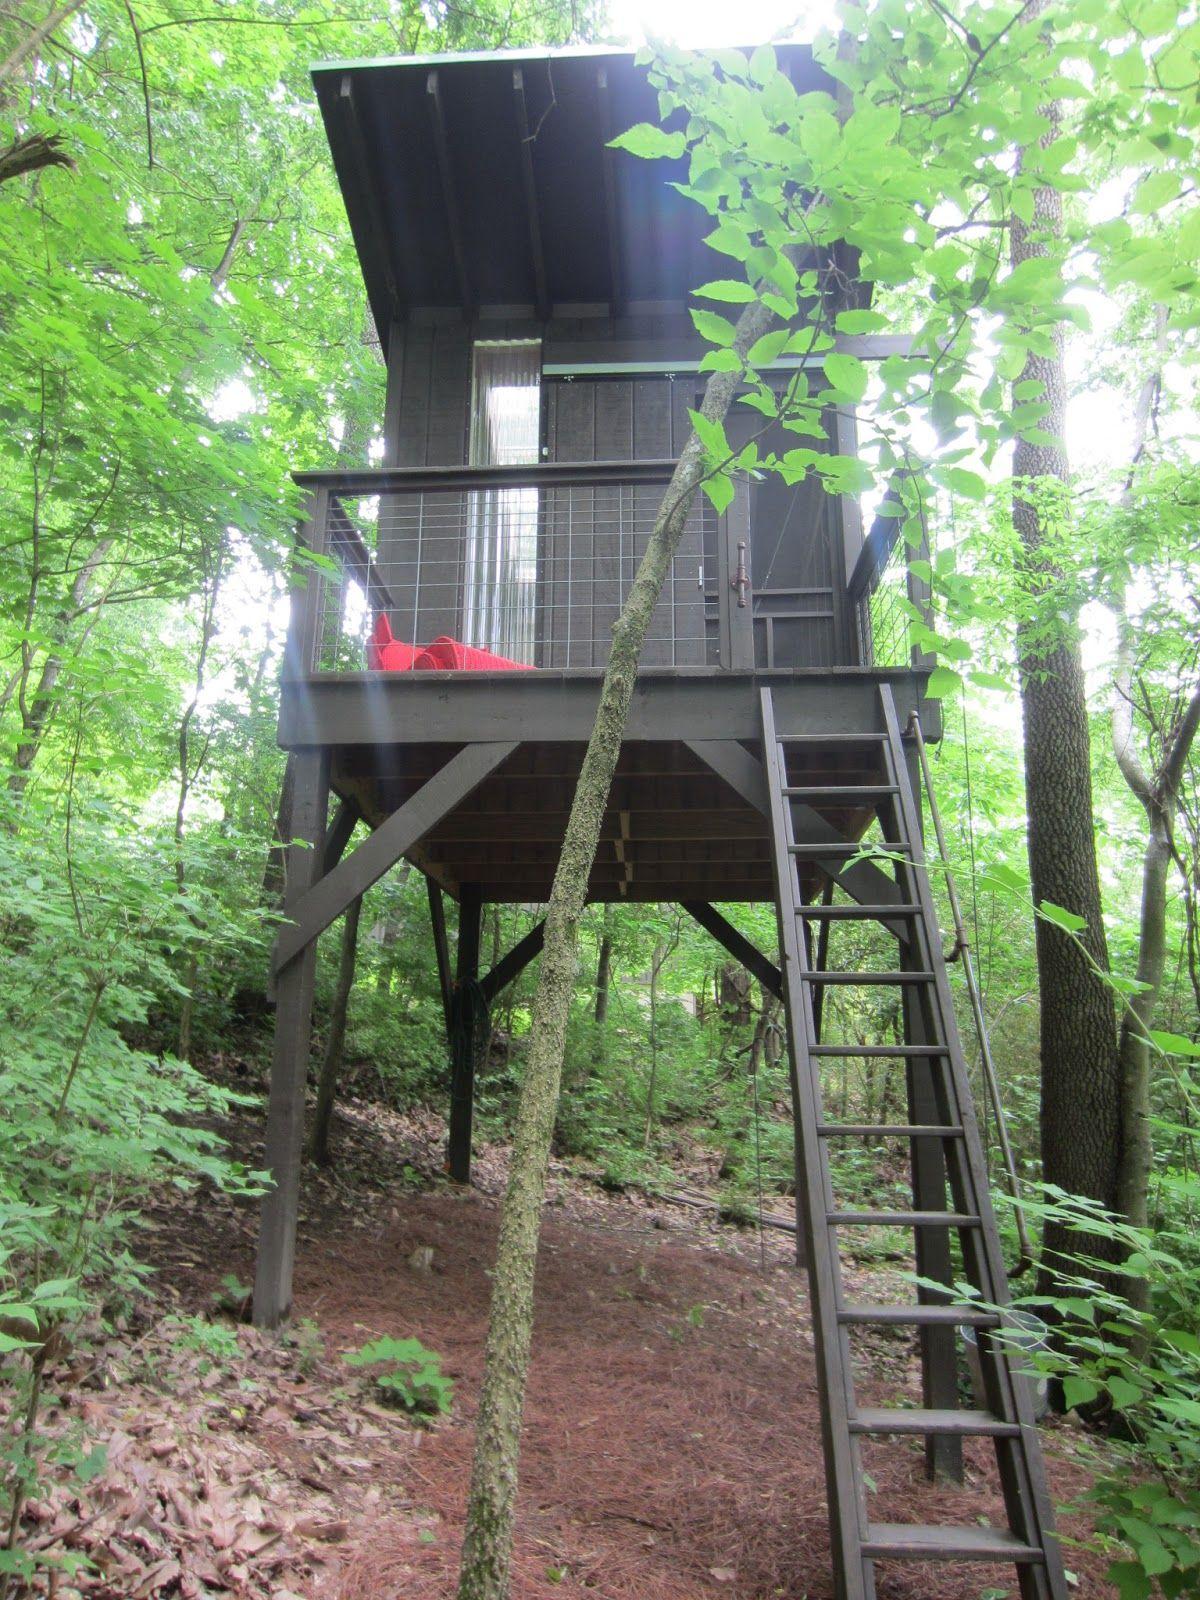 Tiny houses on stilts - A Modern Tree House Tiny Stilt House In Tennessee